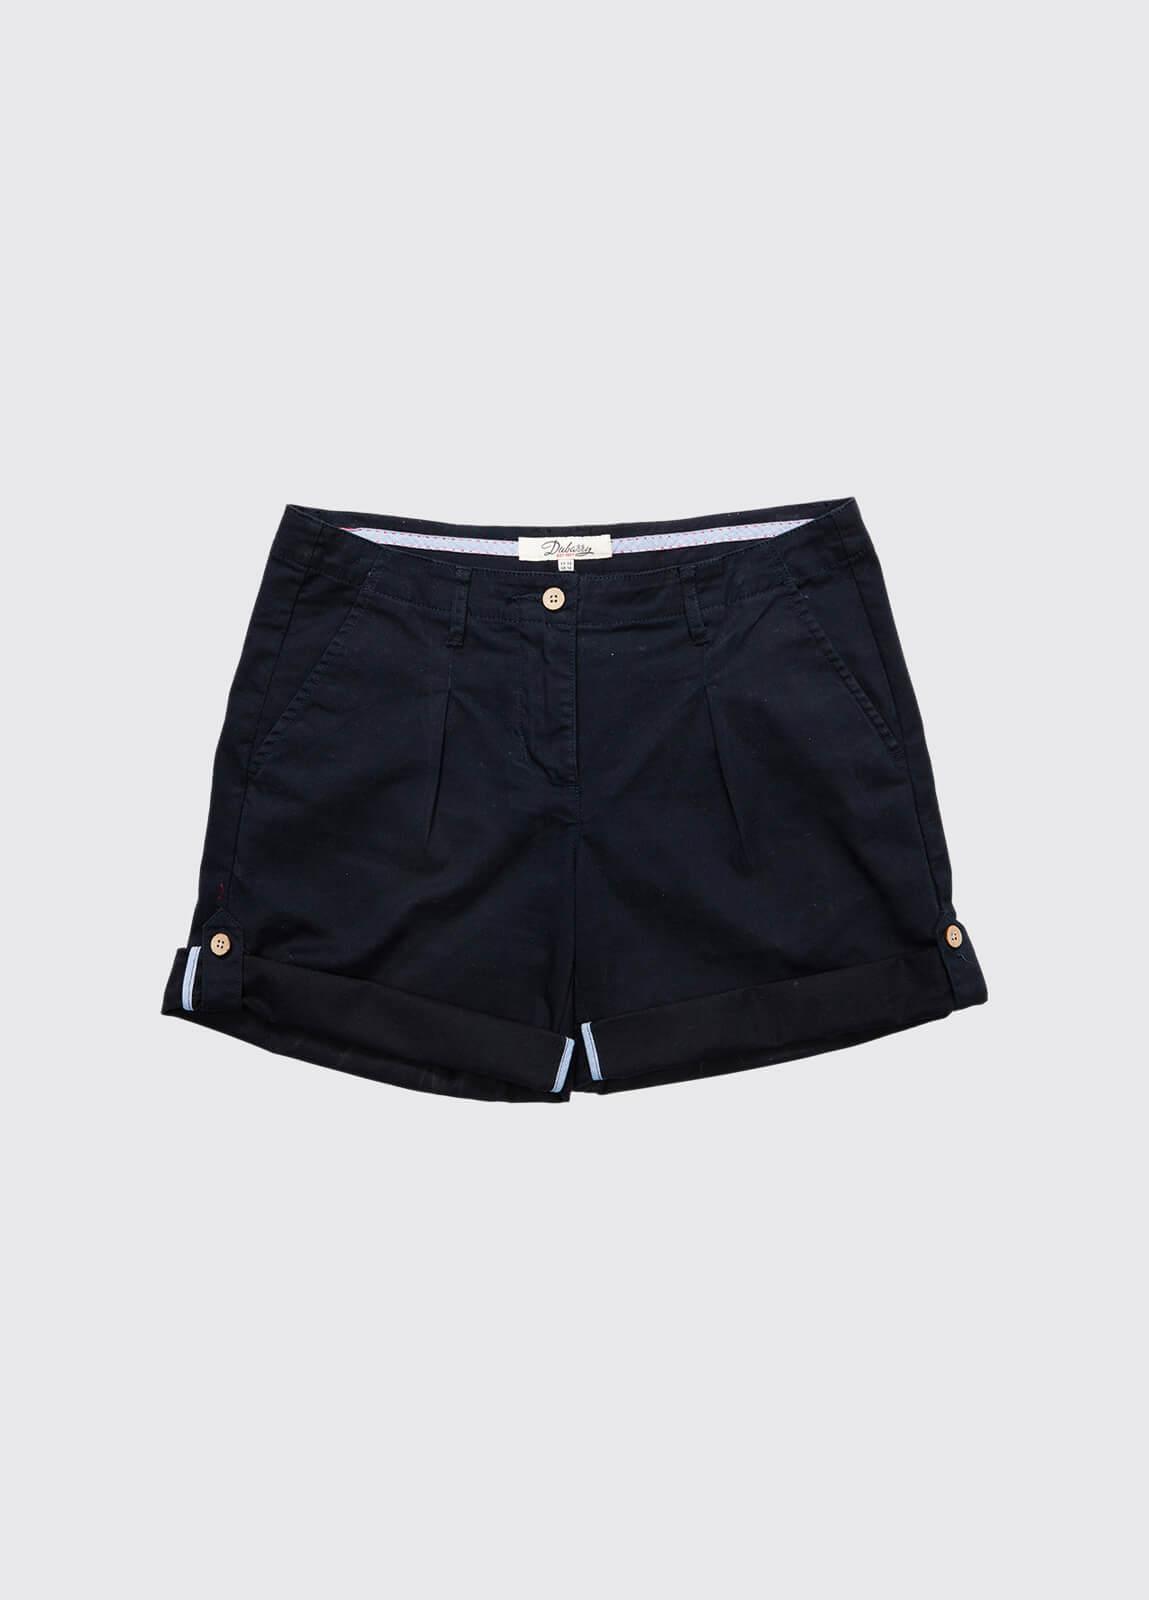 Summerhill ladies shorts - Navy